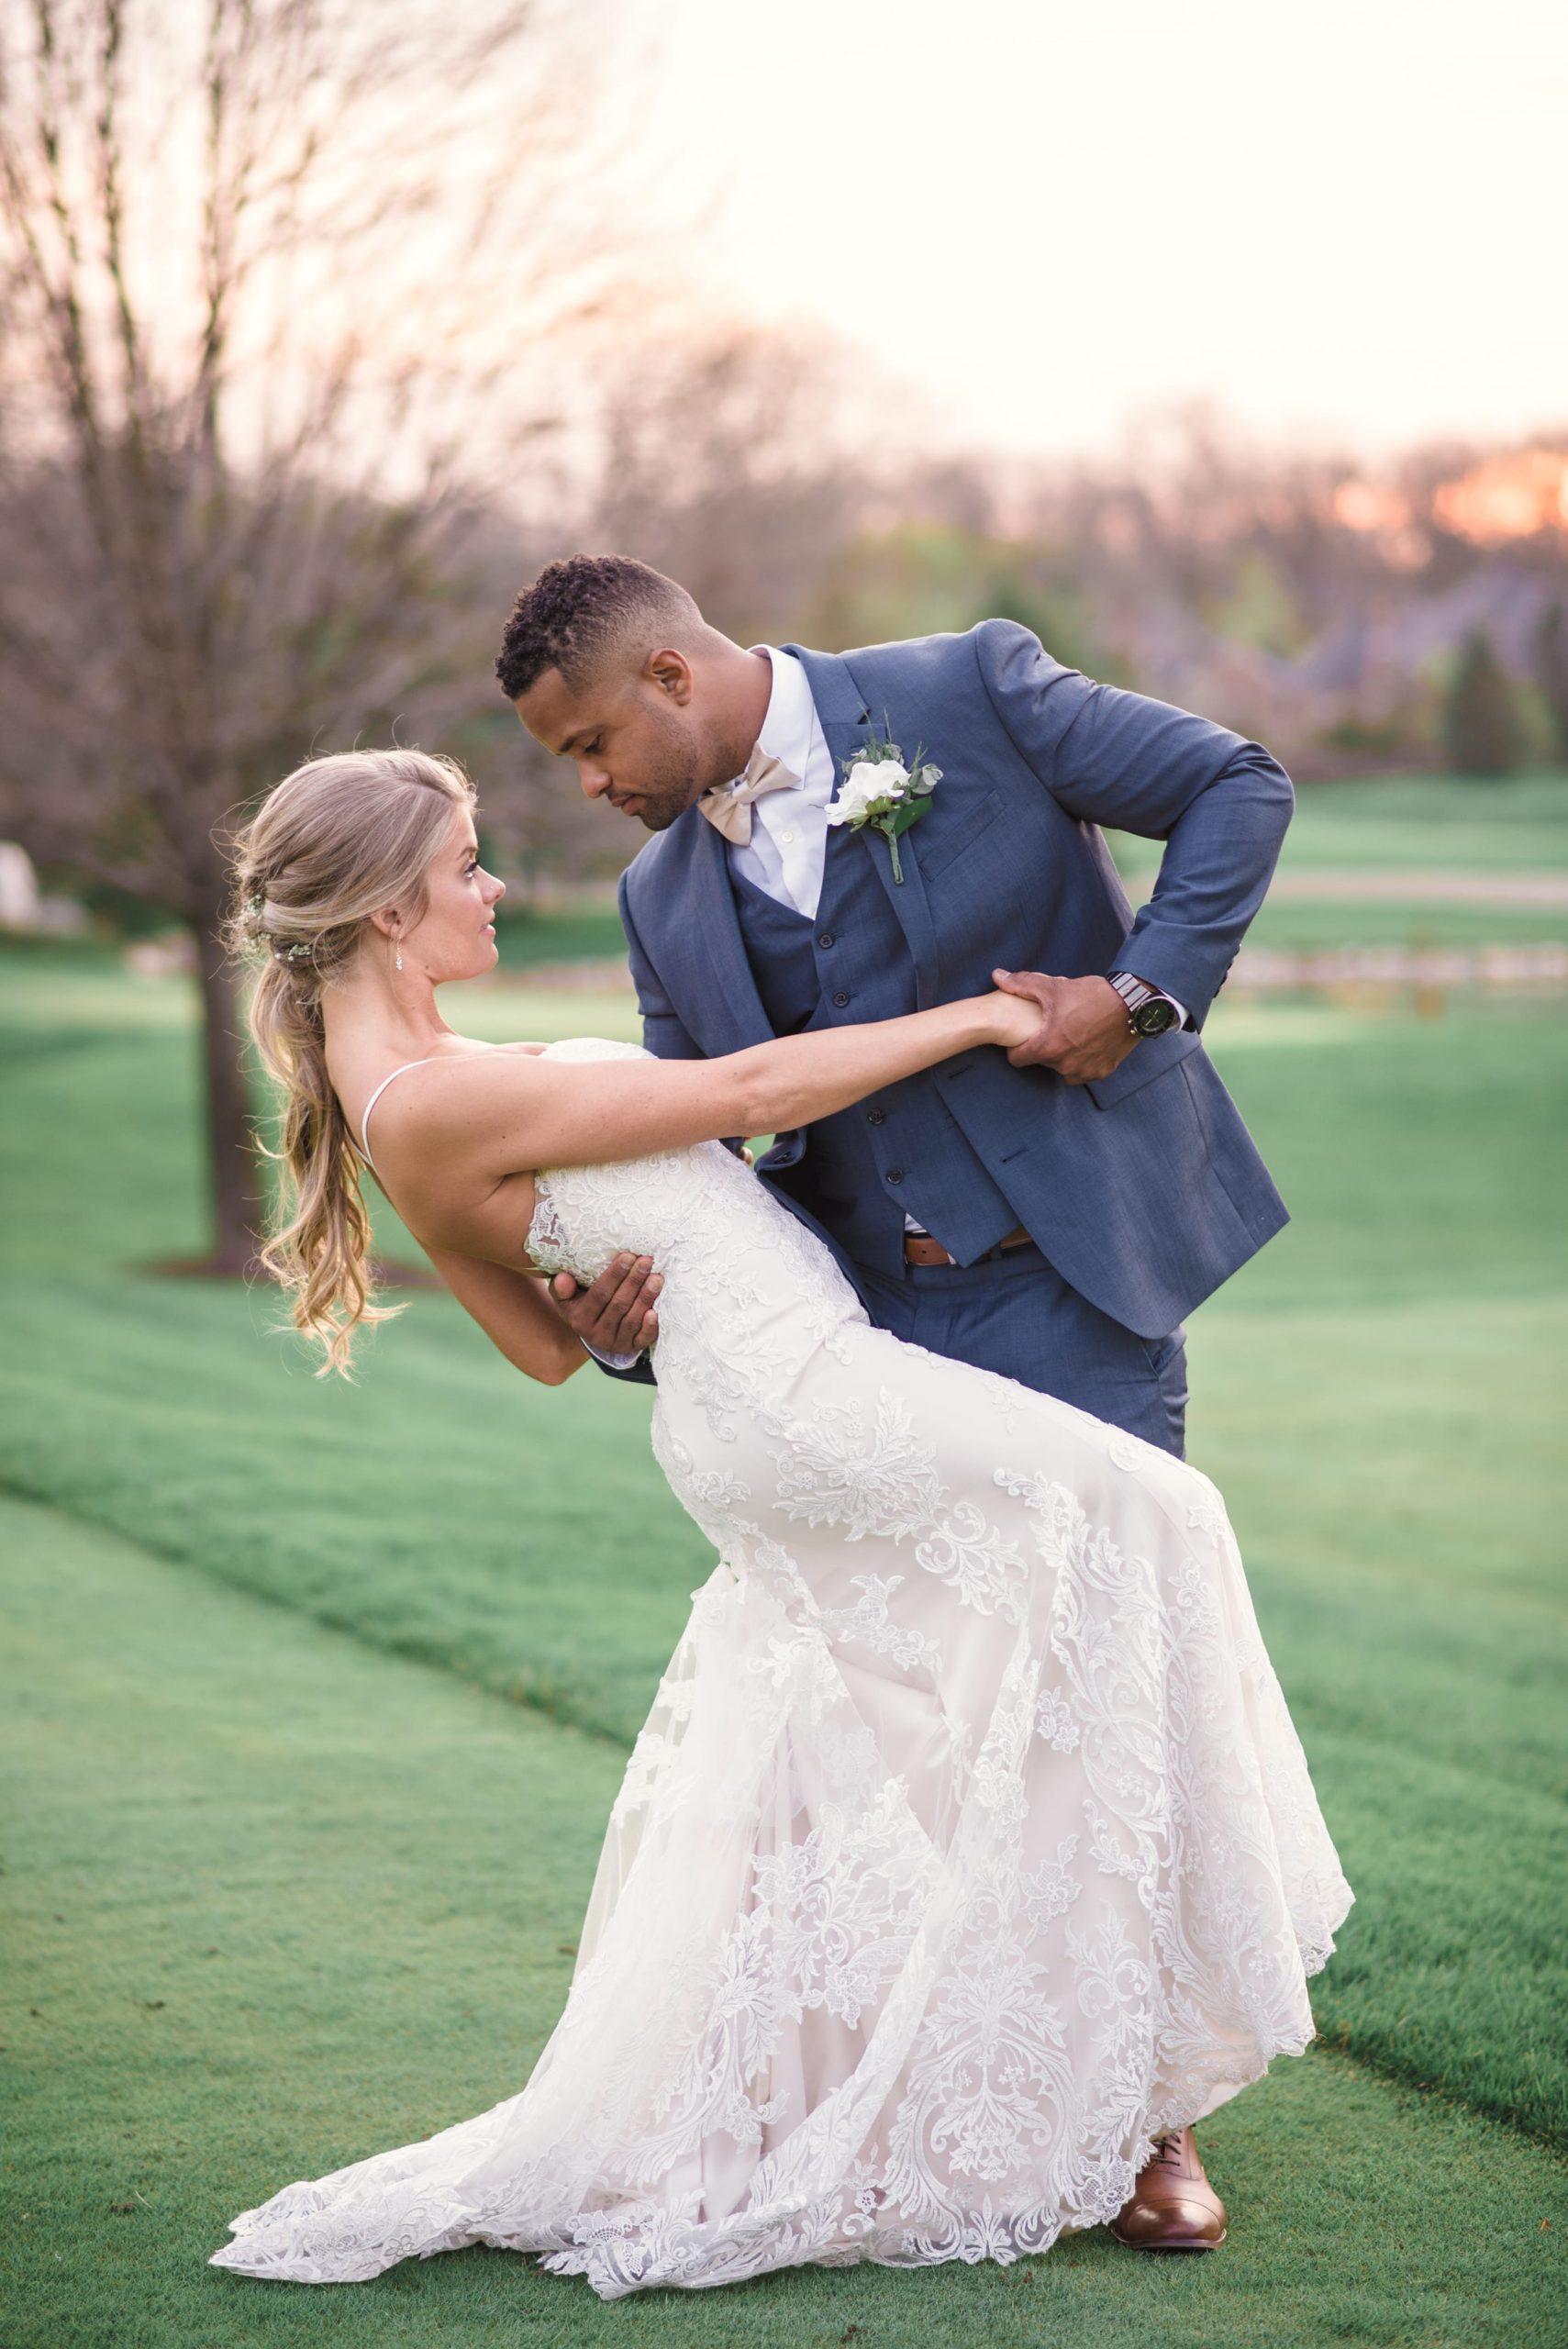 bride and groom wedding photos on golf course